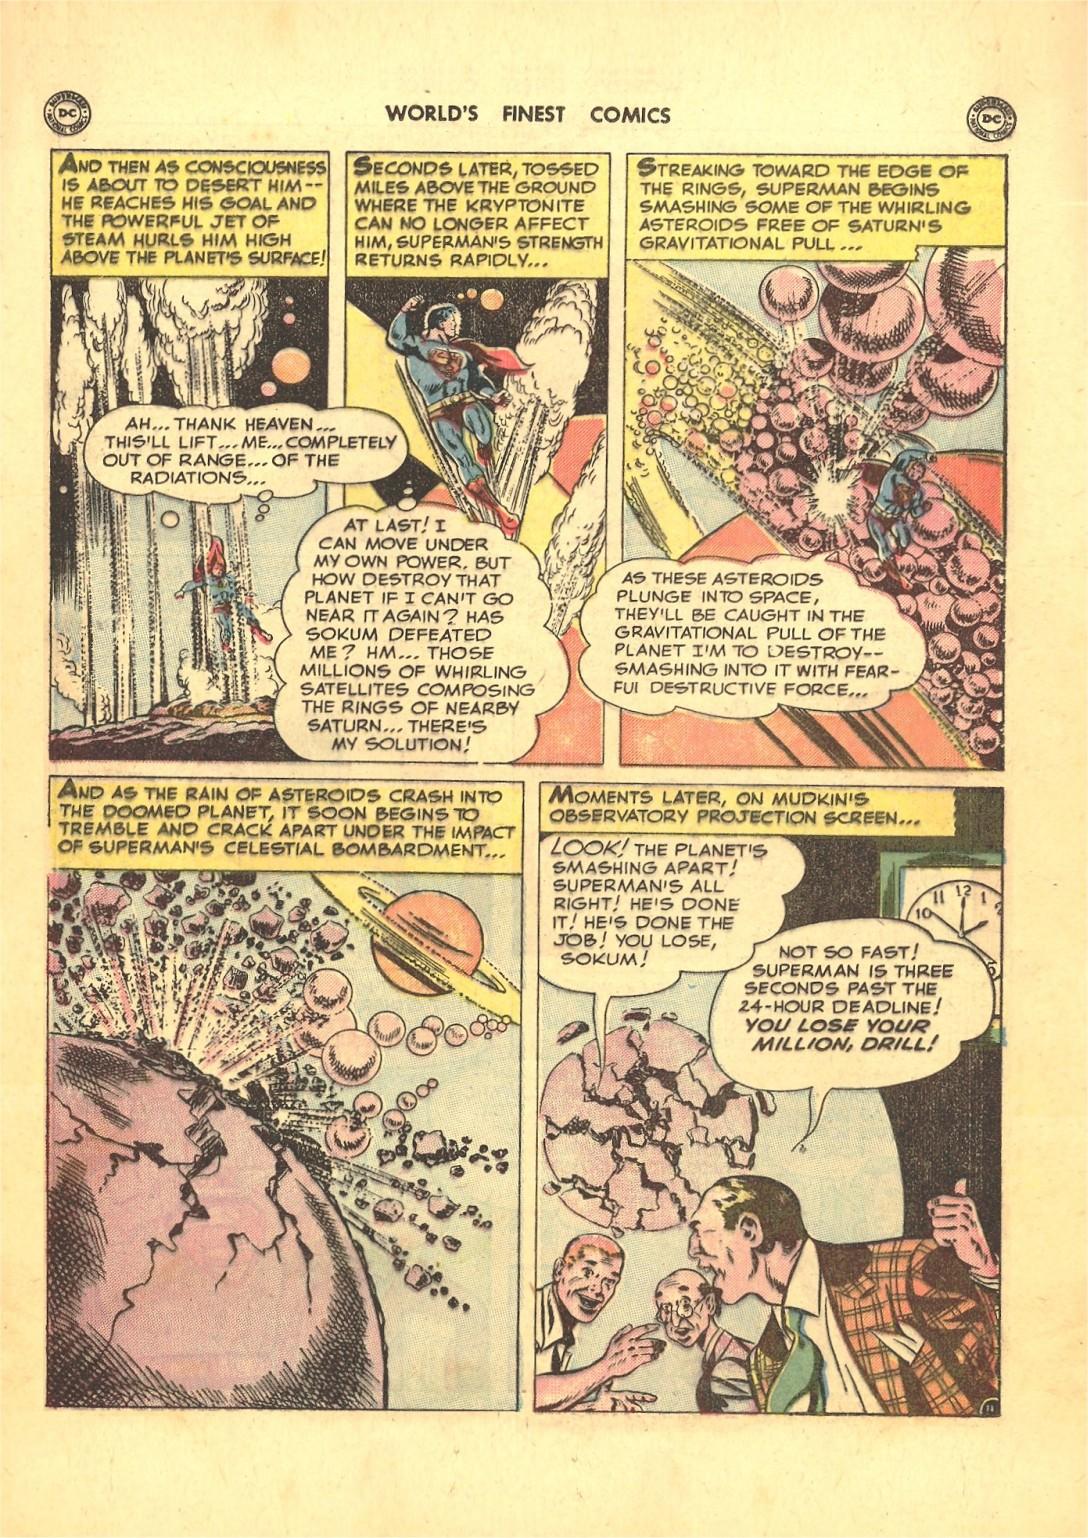 Read online World's Finest Comics comic -  Issue #50 - 13